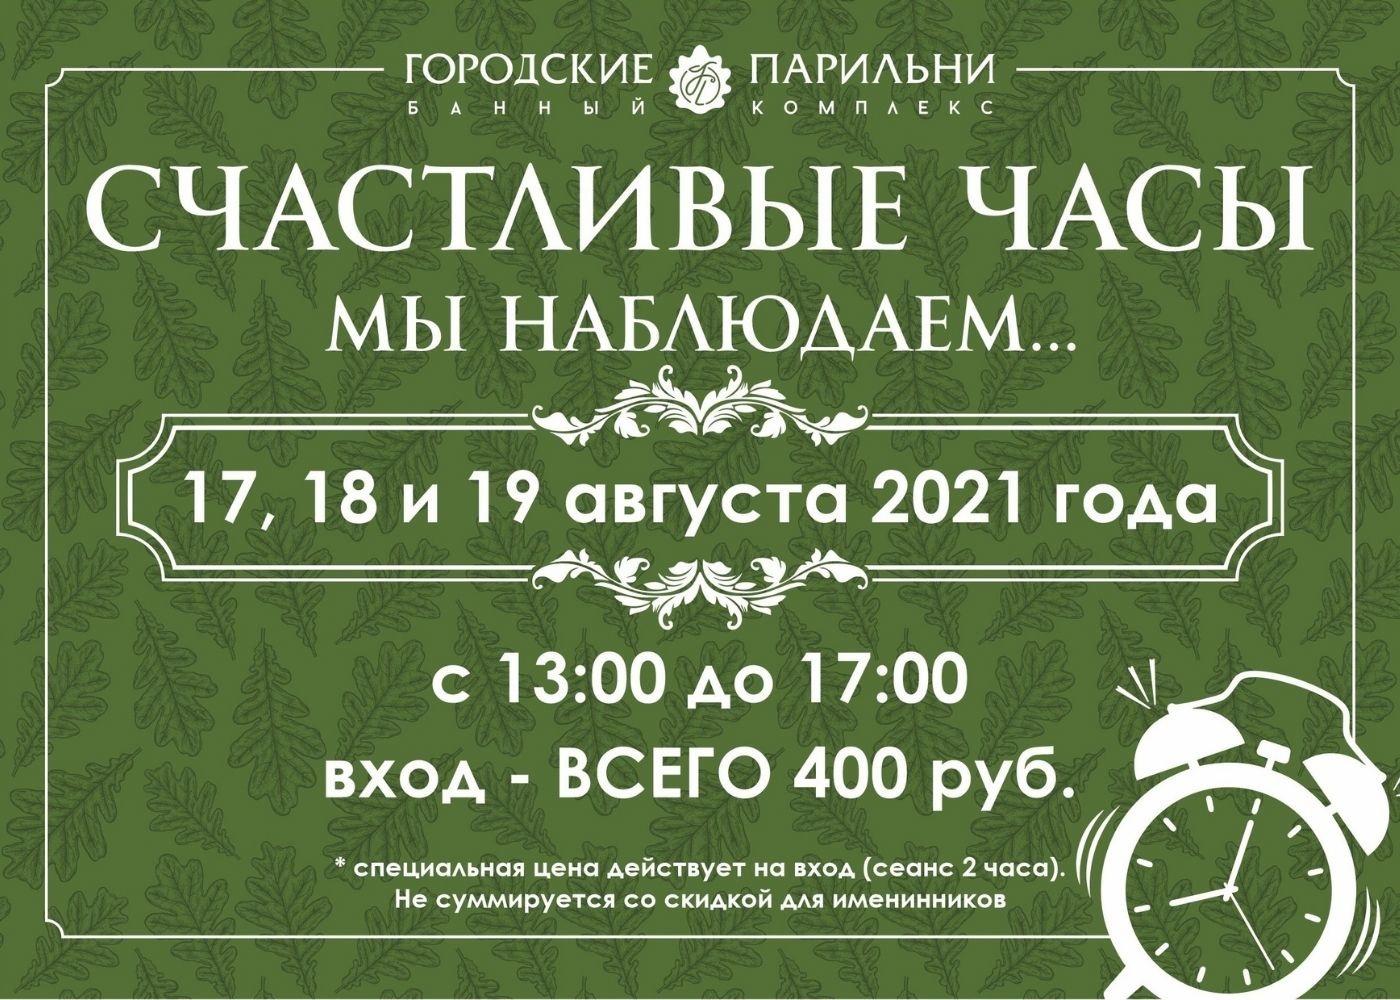 СУПЕР-ЦЕНА на вход в период 17.08.2021-19.08.2021 с 13:00 до 17:00